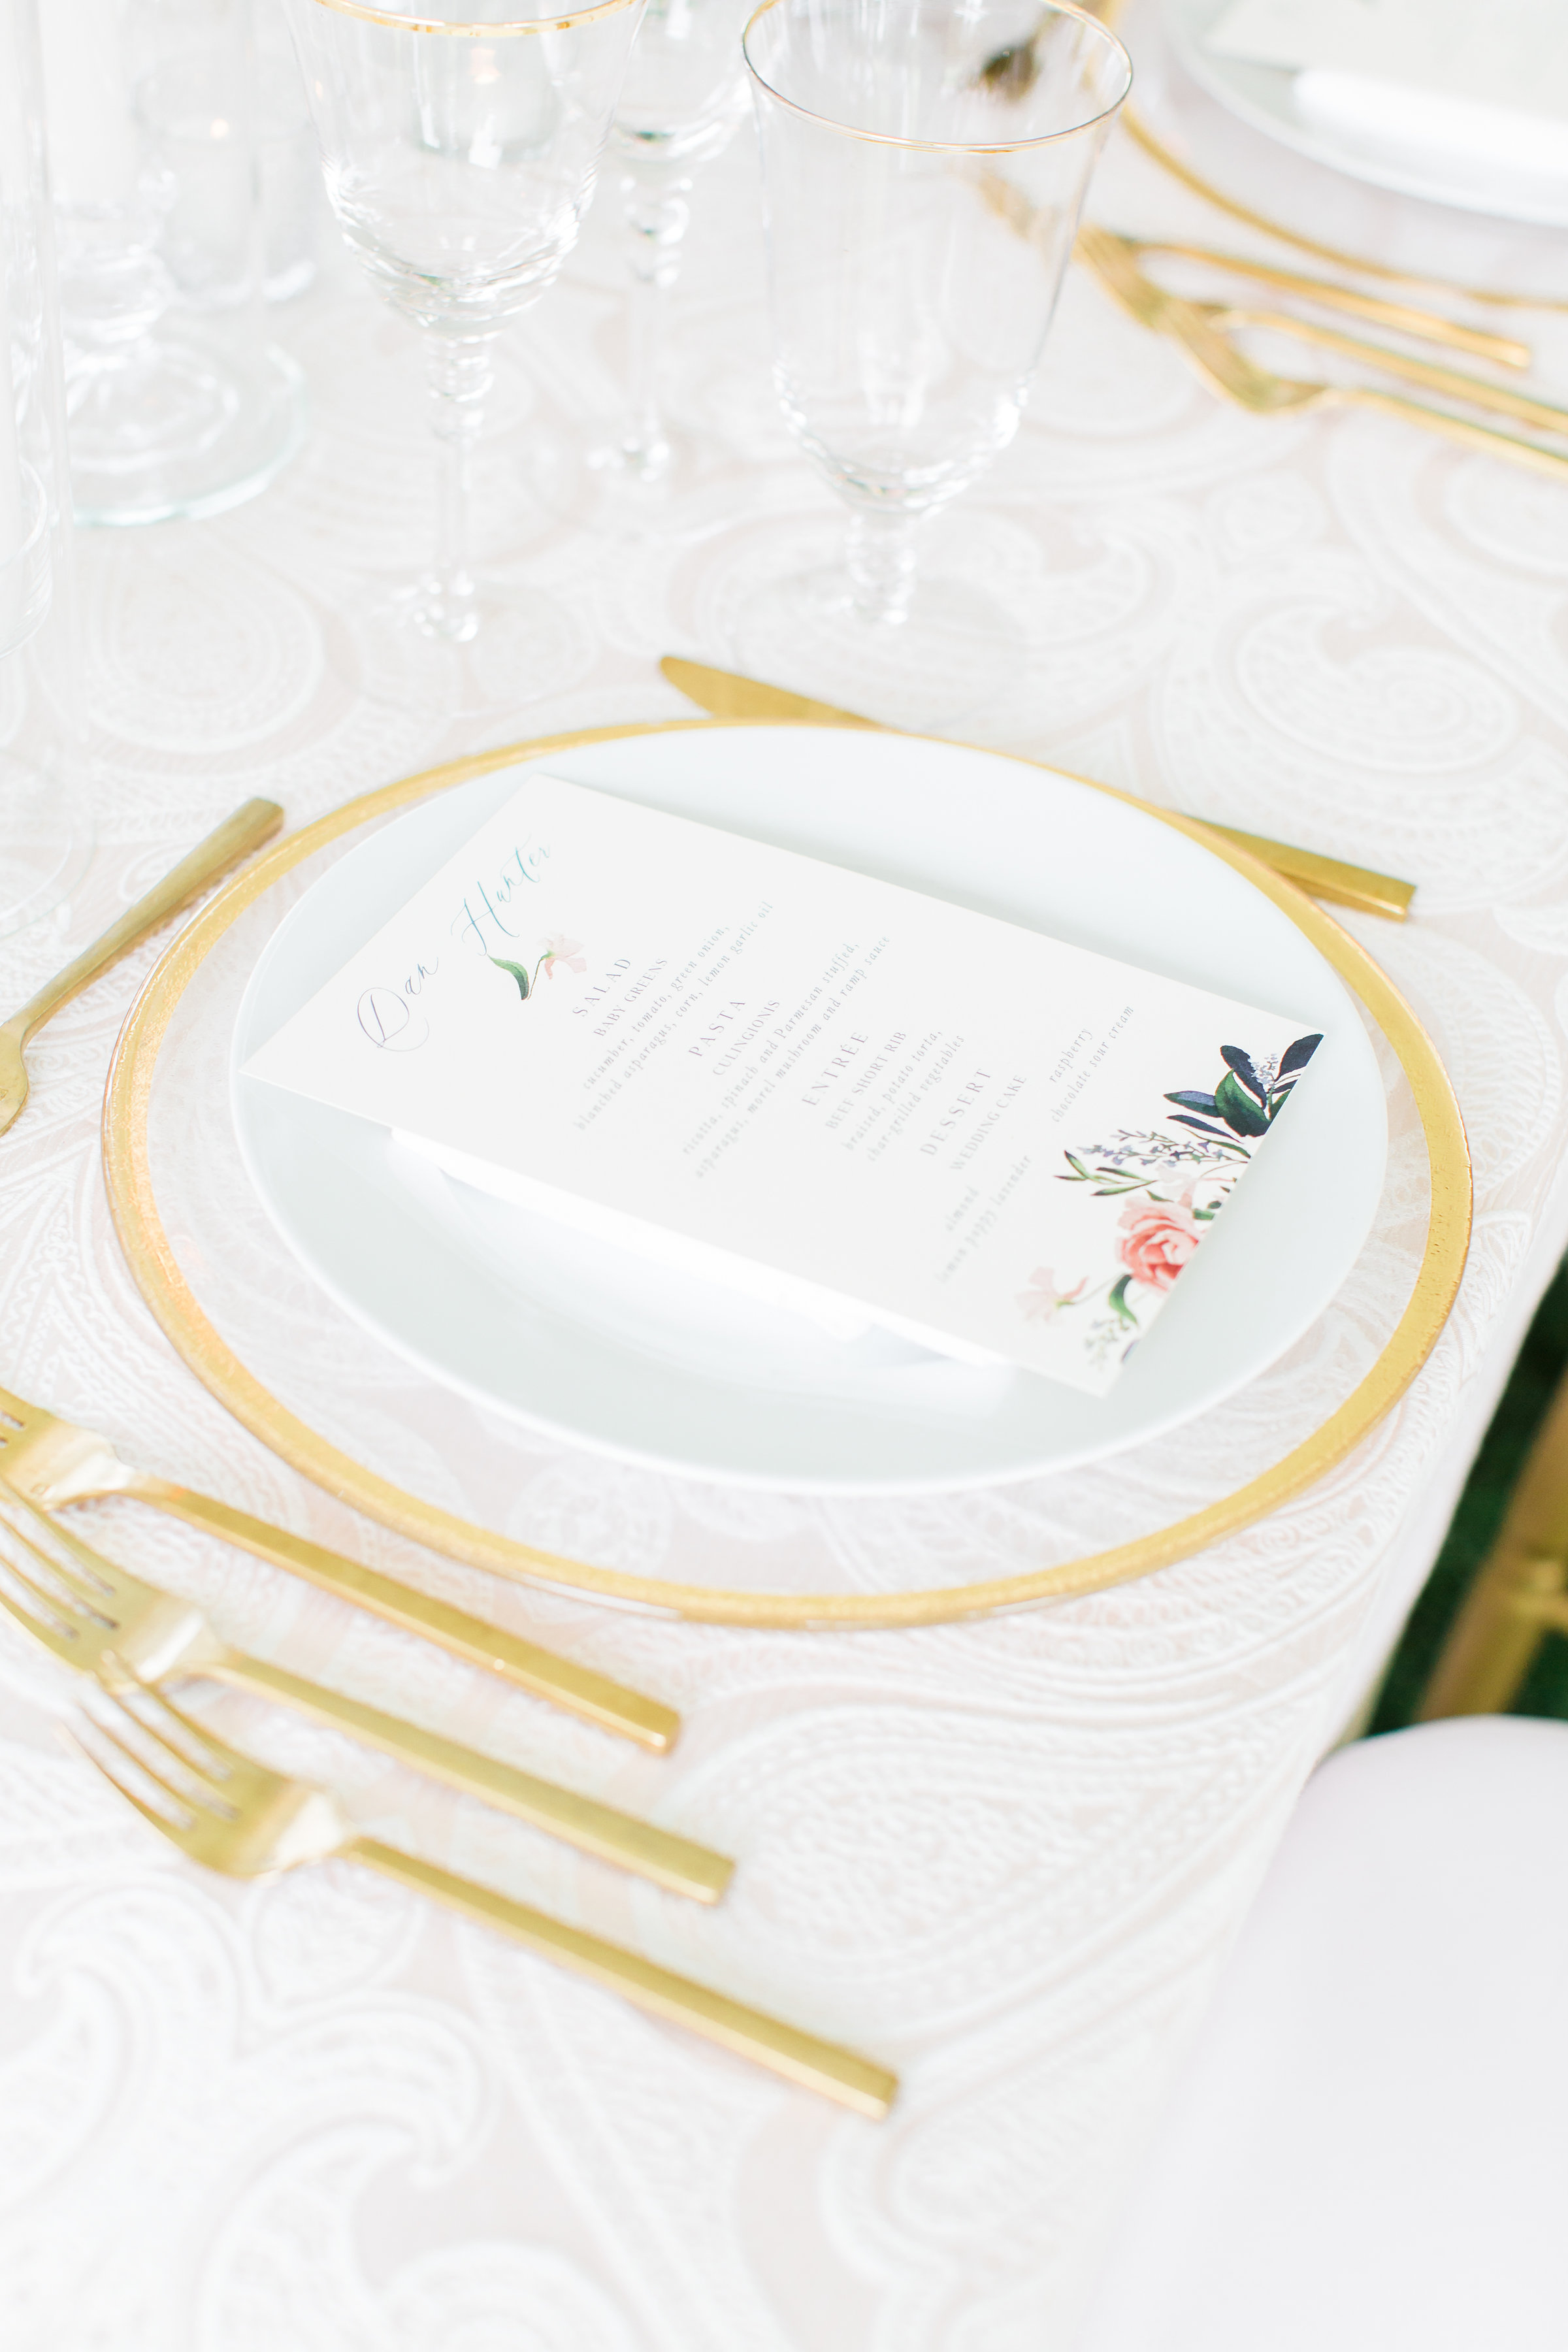 Coffman+Wedding+Reception+Details-7.jpg